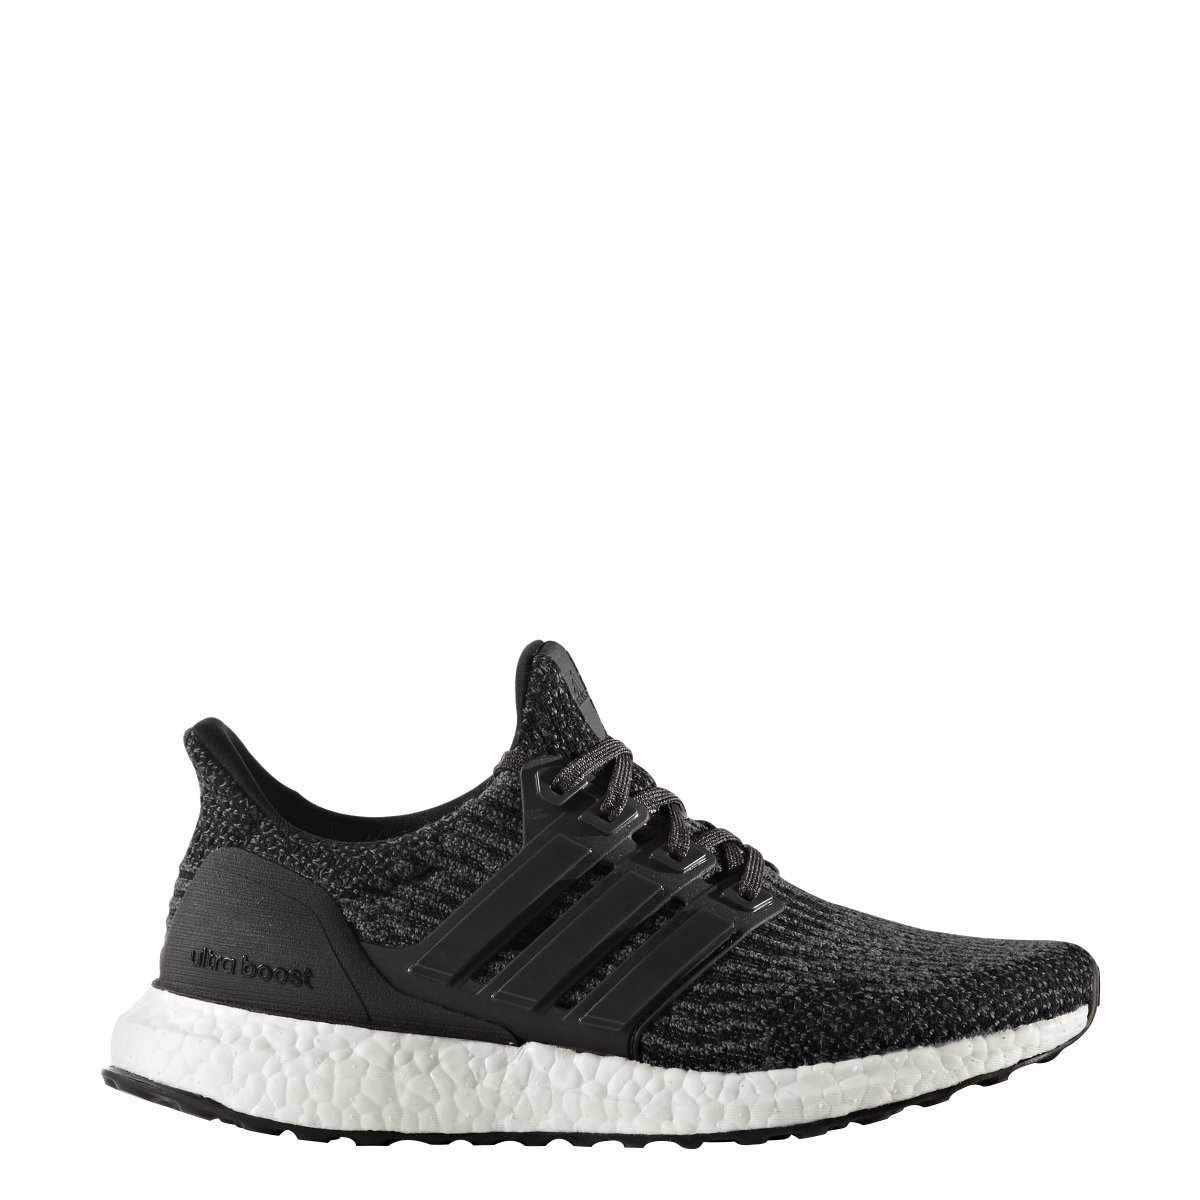 adidas Ultraboost 3.0 Shoe - Junior's Running 5.5 Core Black/Utility Black